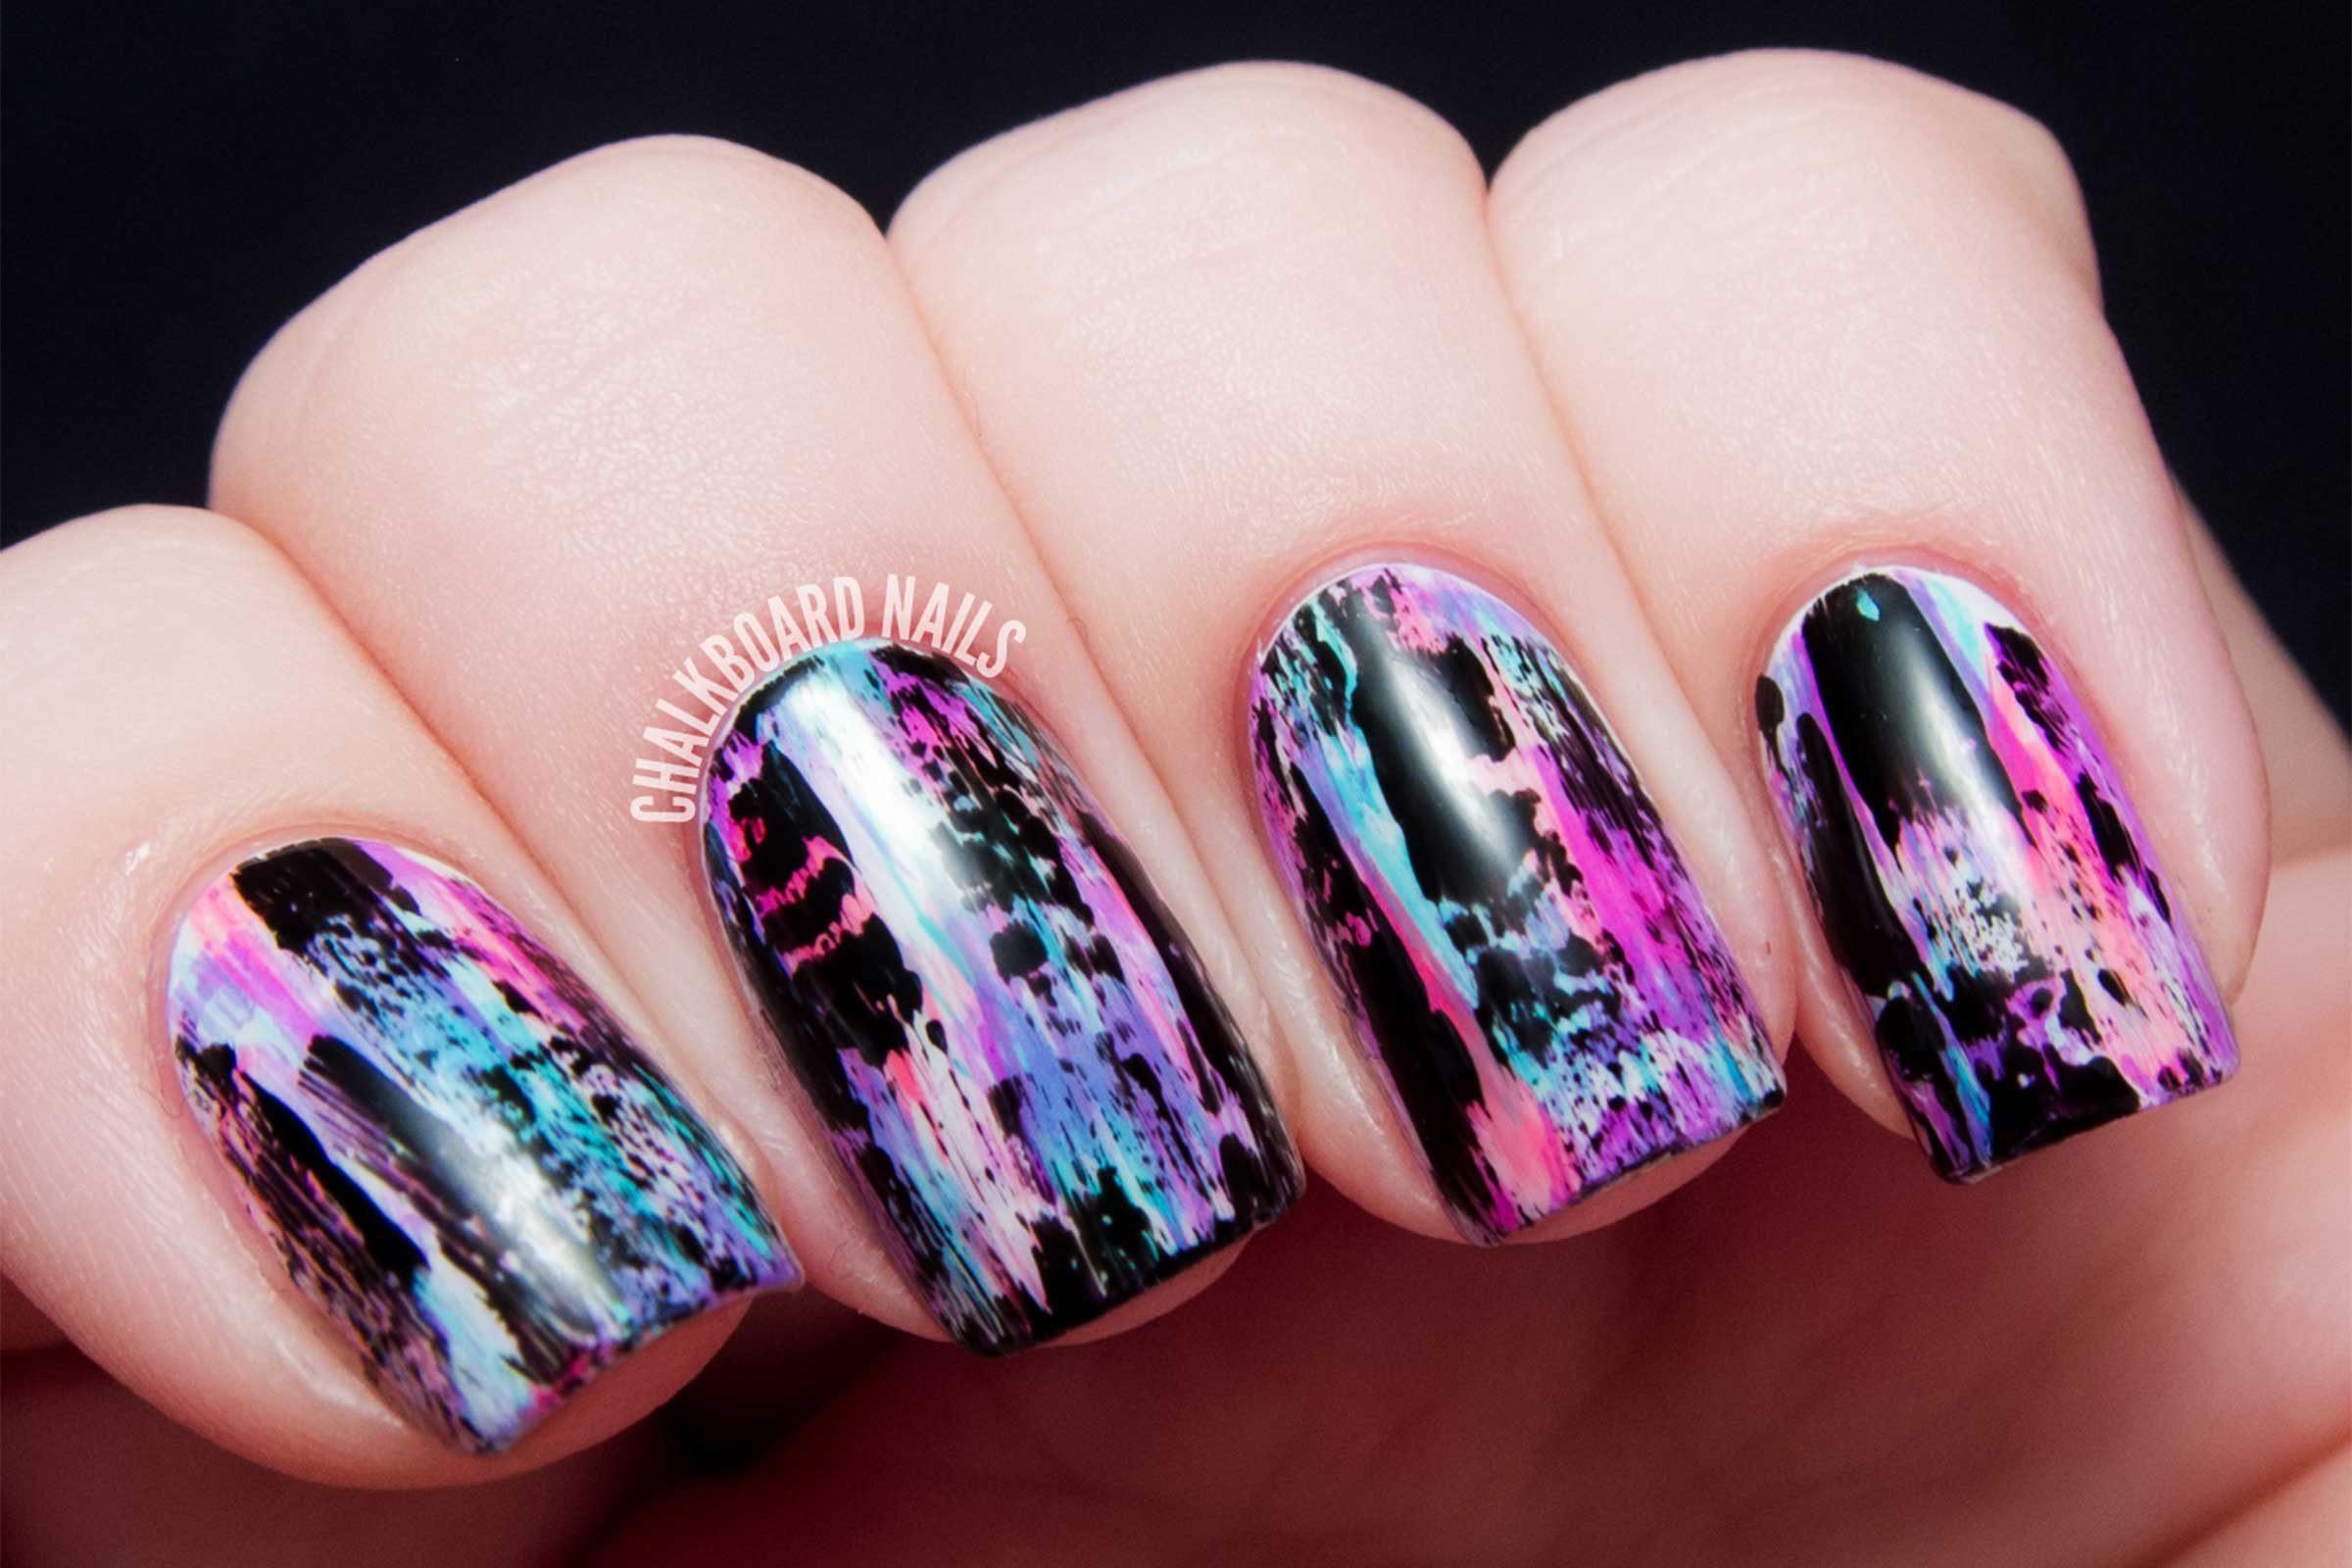 Simple Nail Art Designs  Nail Art Designs Easy Hacks for DIY Manicures